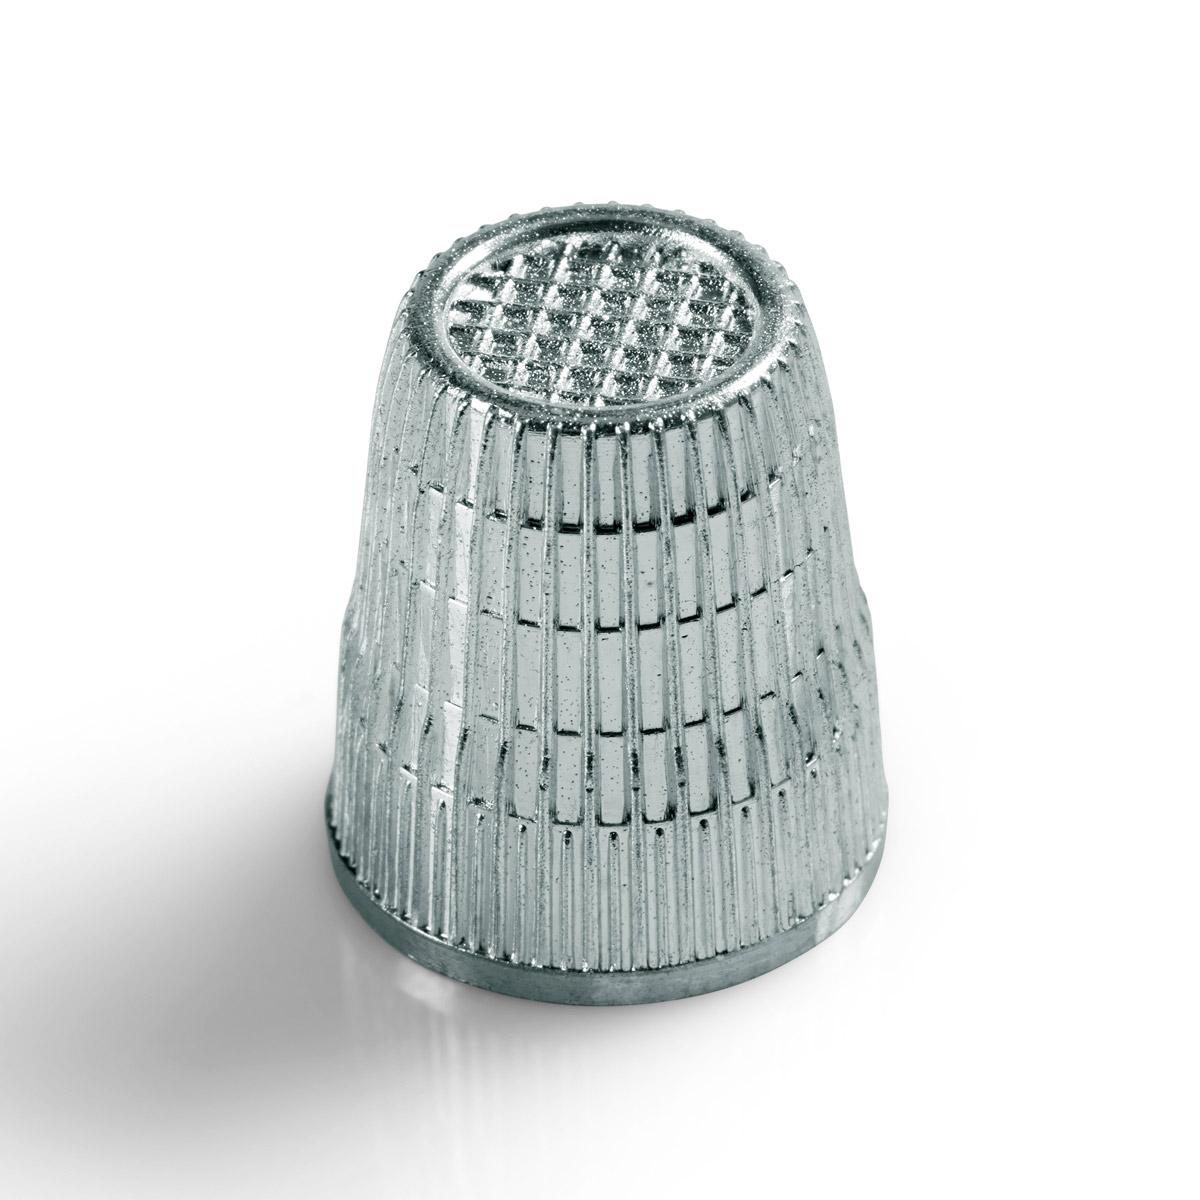 431845 Наперсток, цинк, хромовое покр., серебристый цв. 15 мм Prym